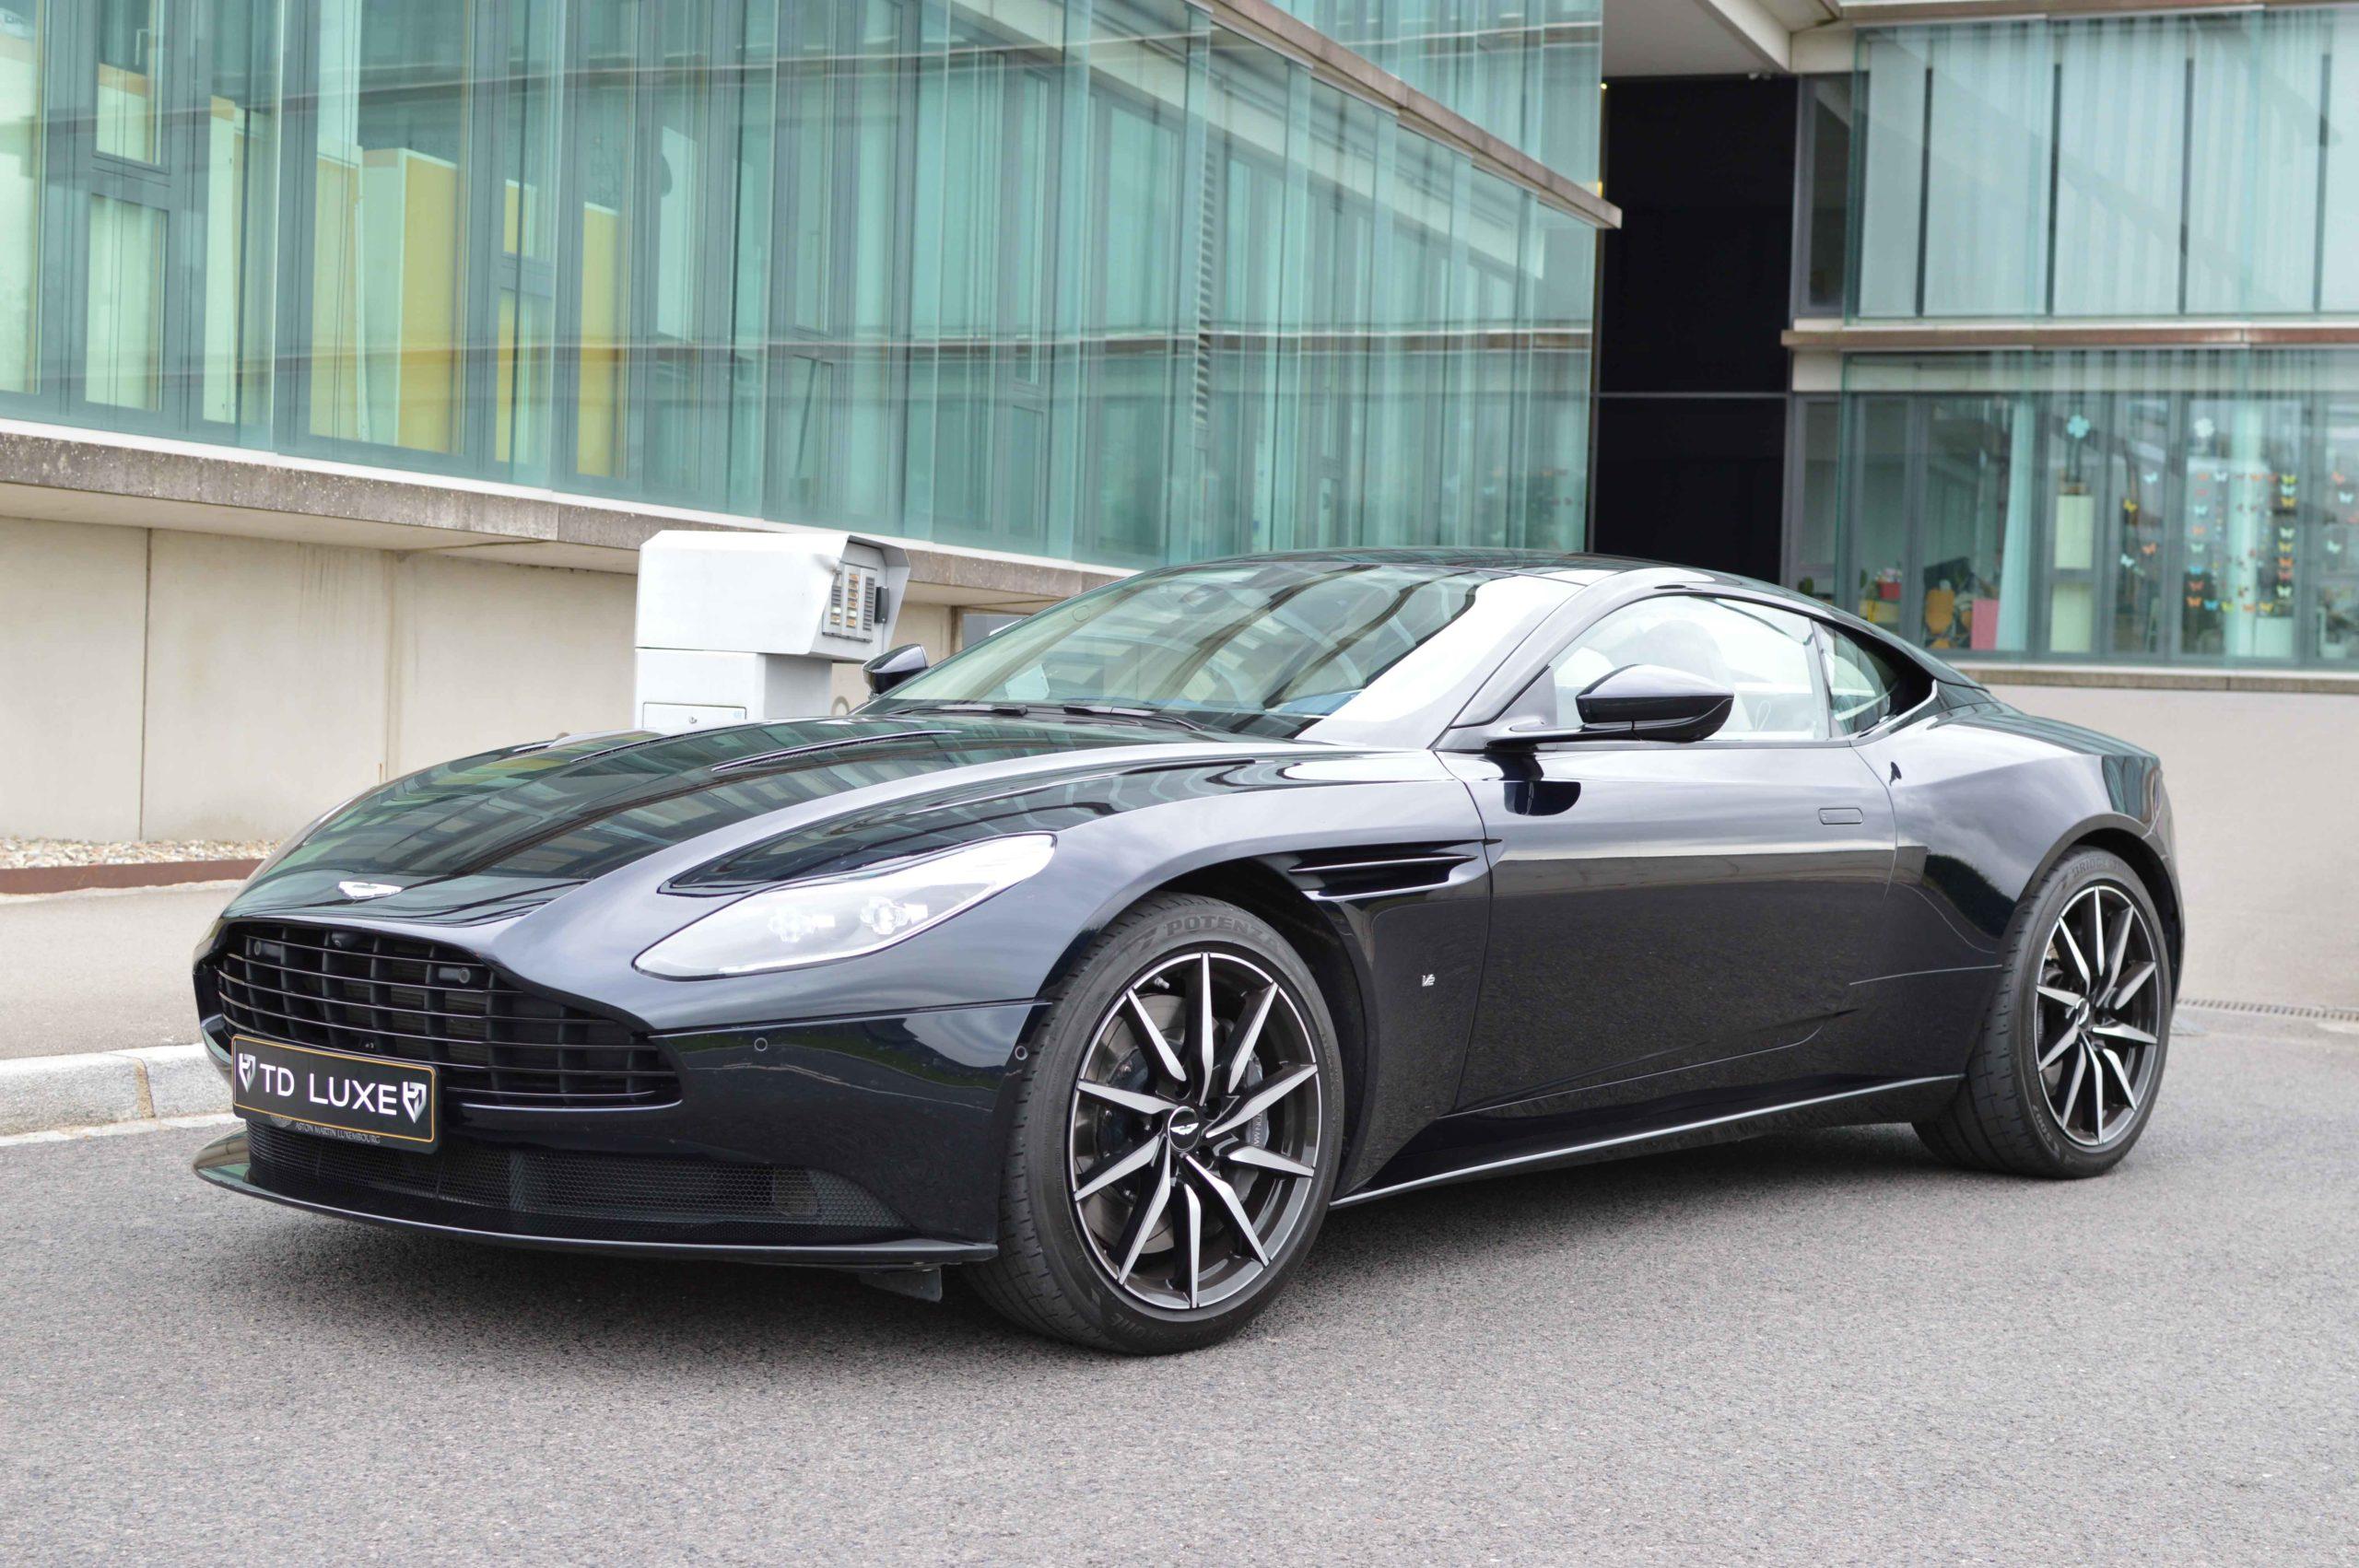 Aston Martin Db11 Td Luxe